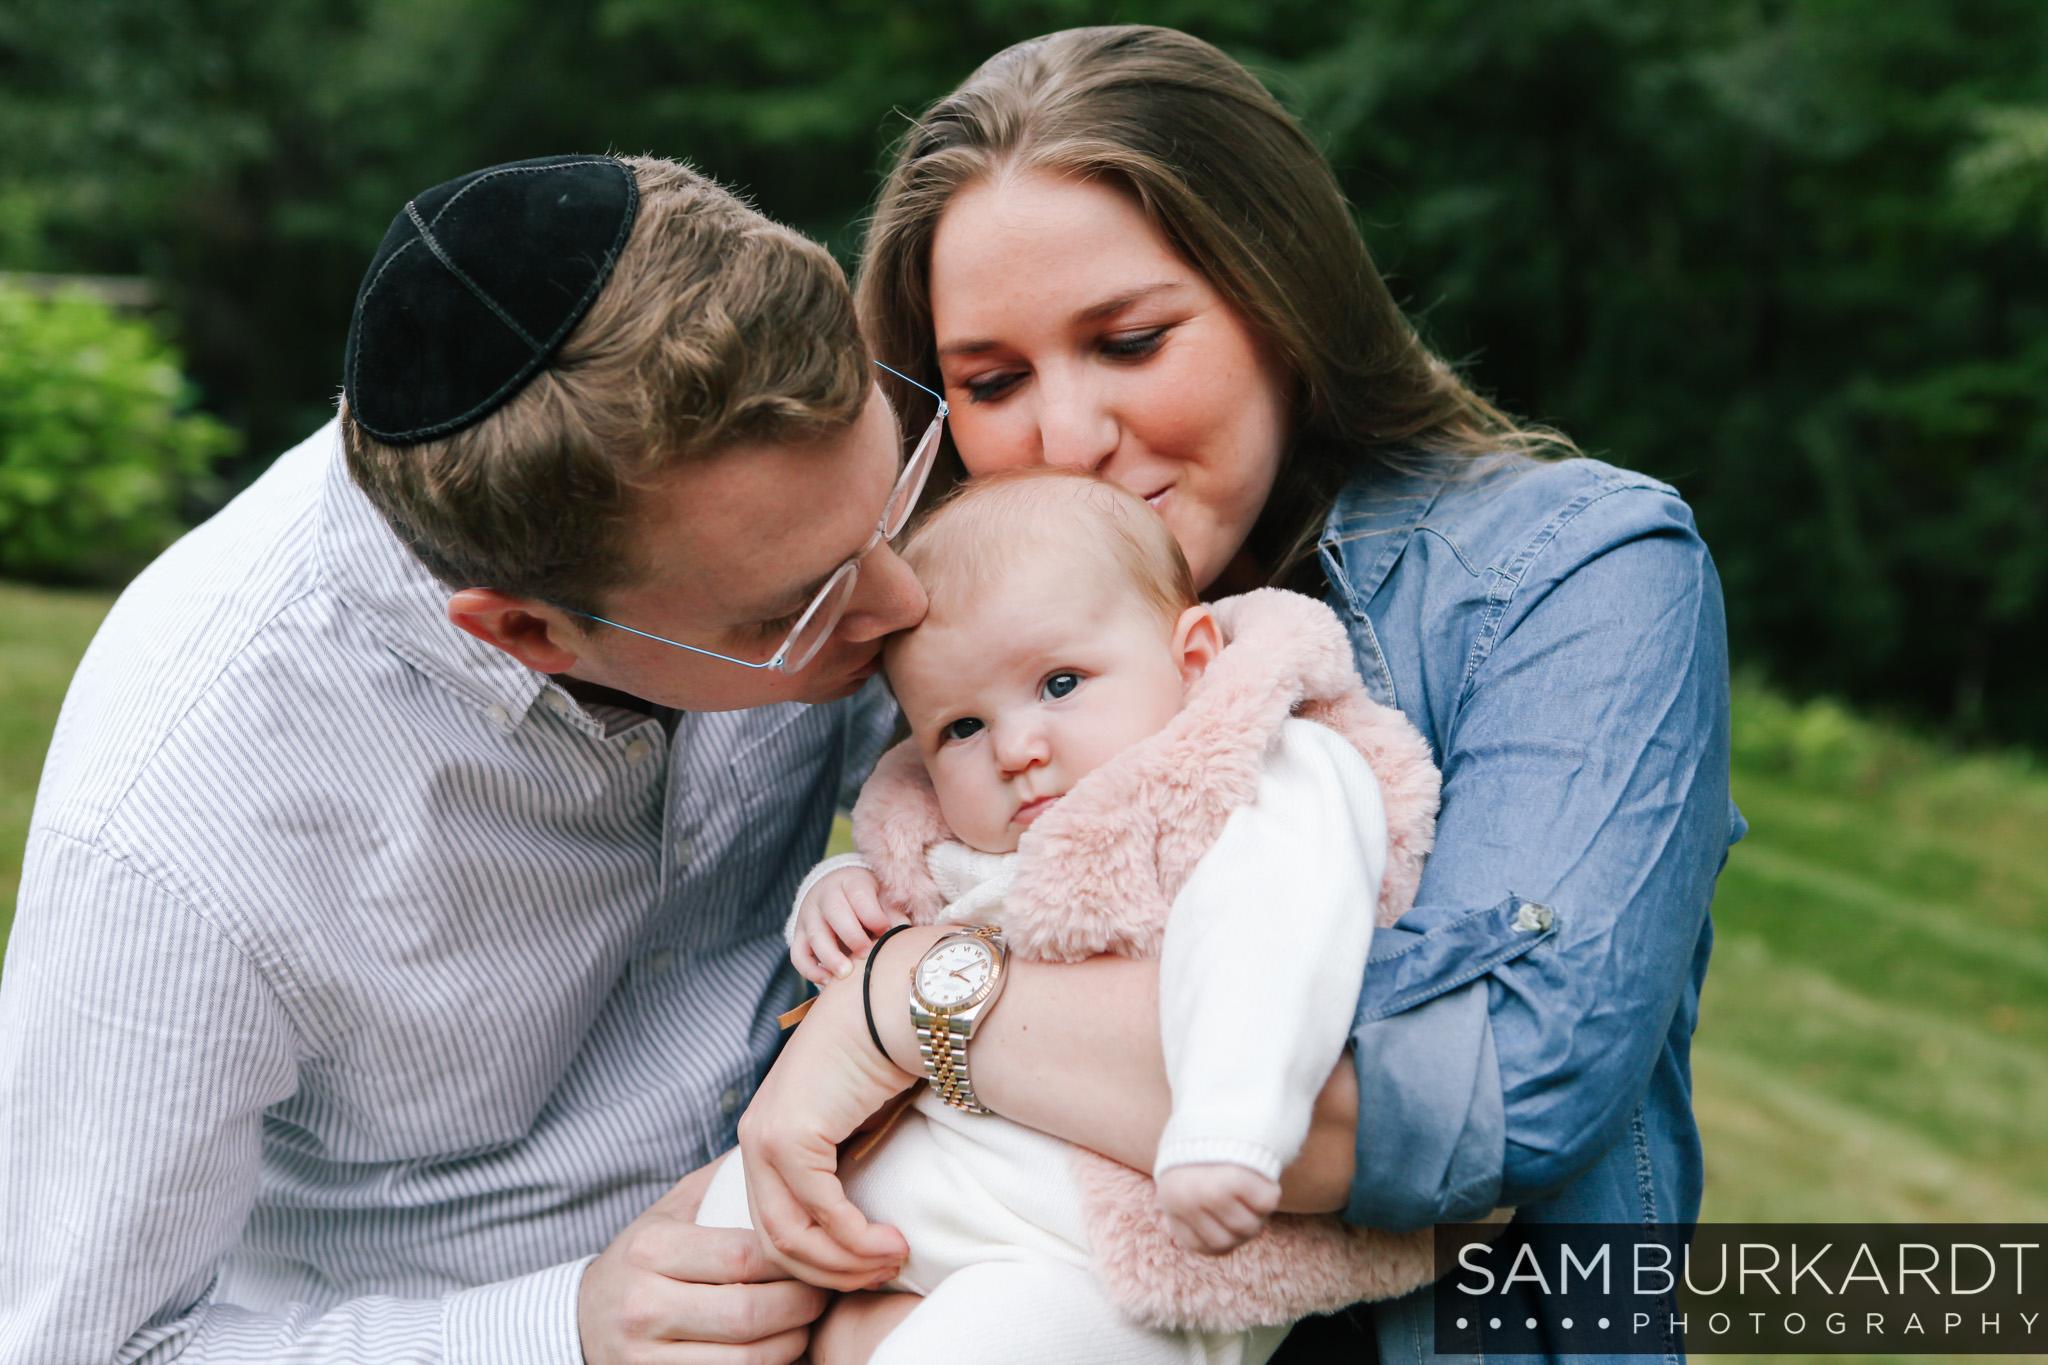 sburkardt_family_photos_fall_portraits_connecticut_washington_011.jpg